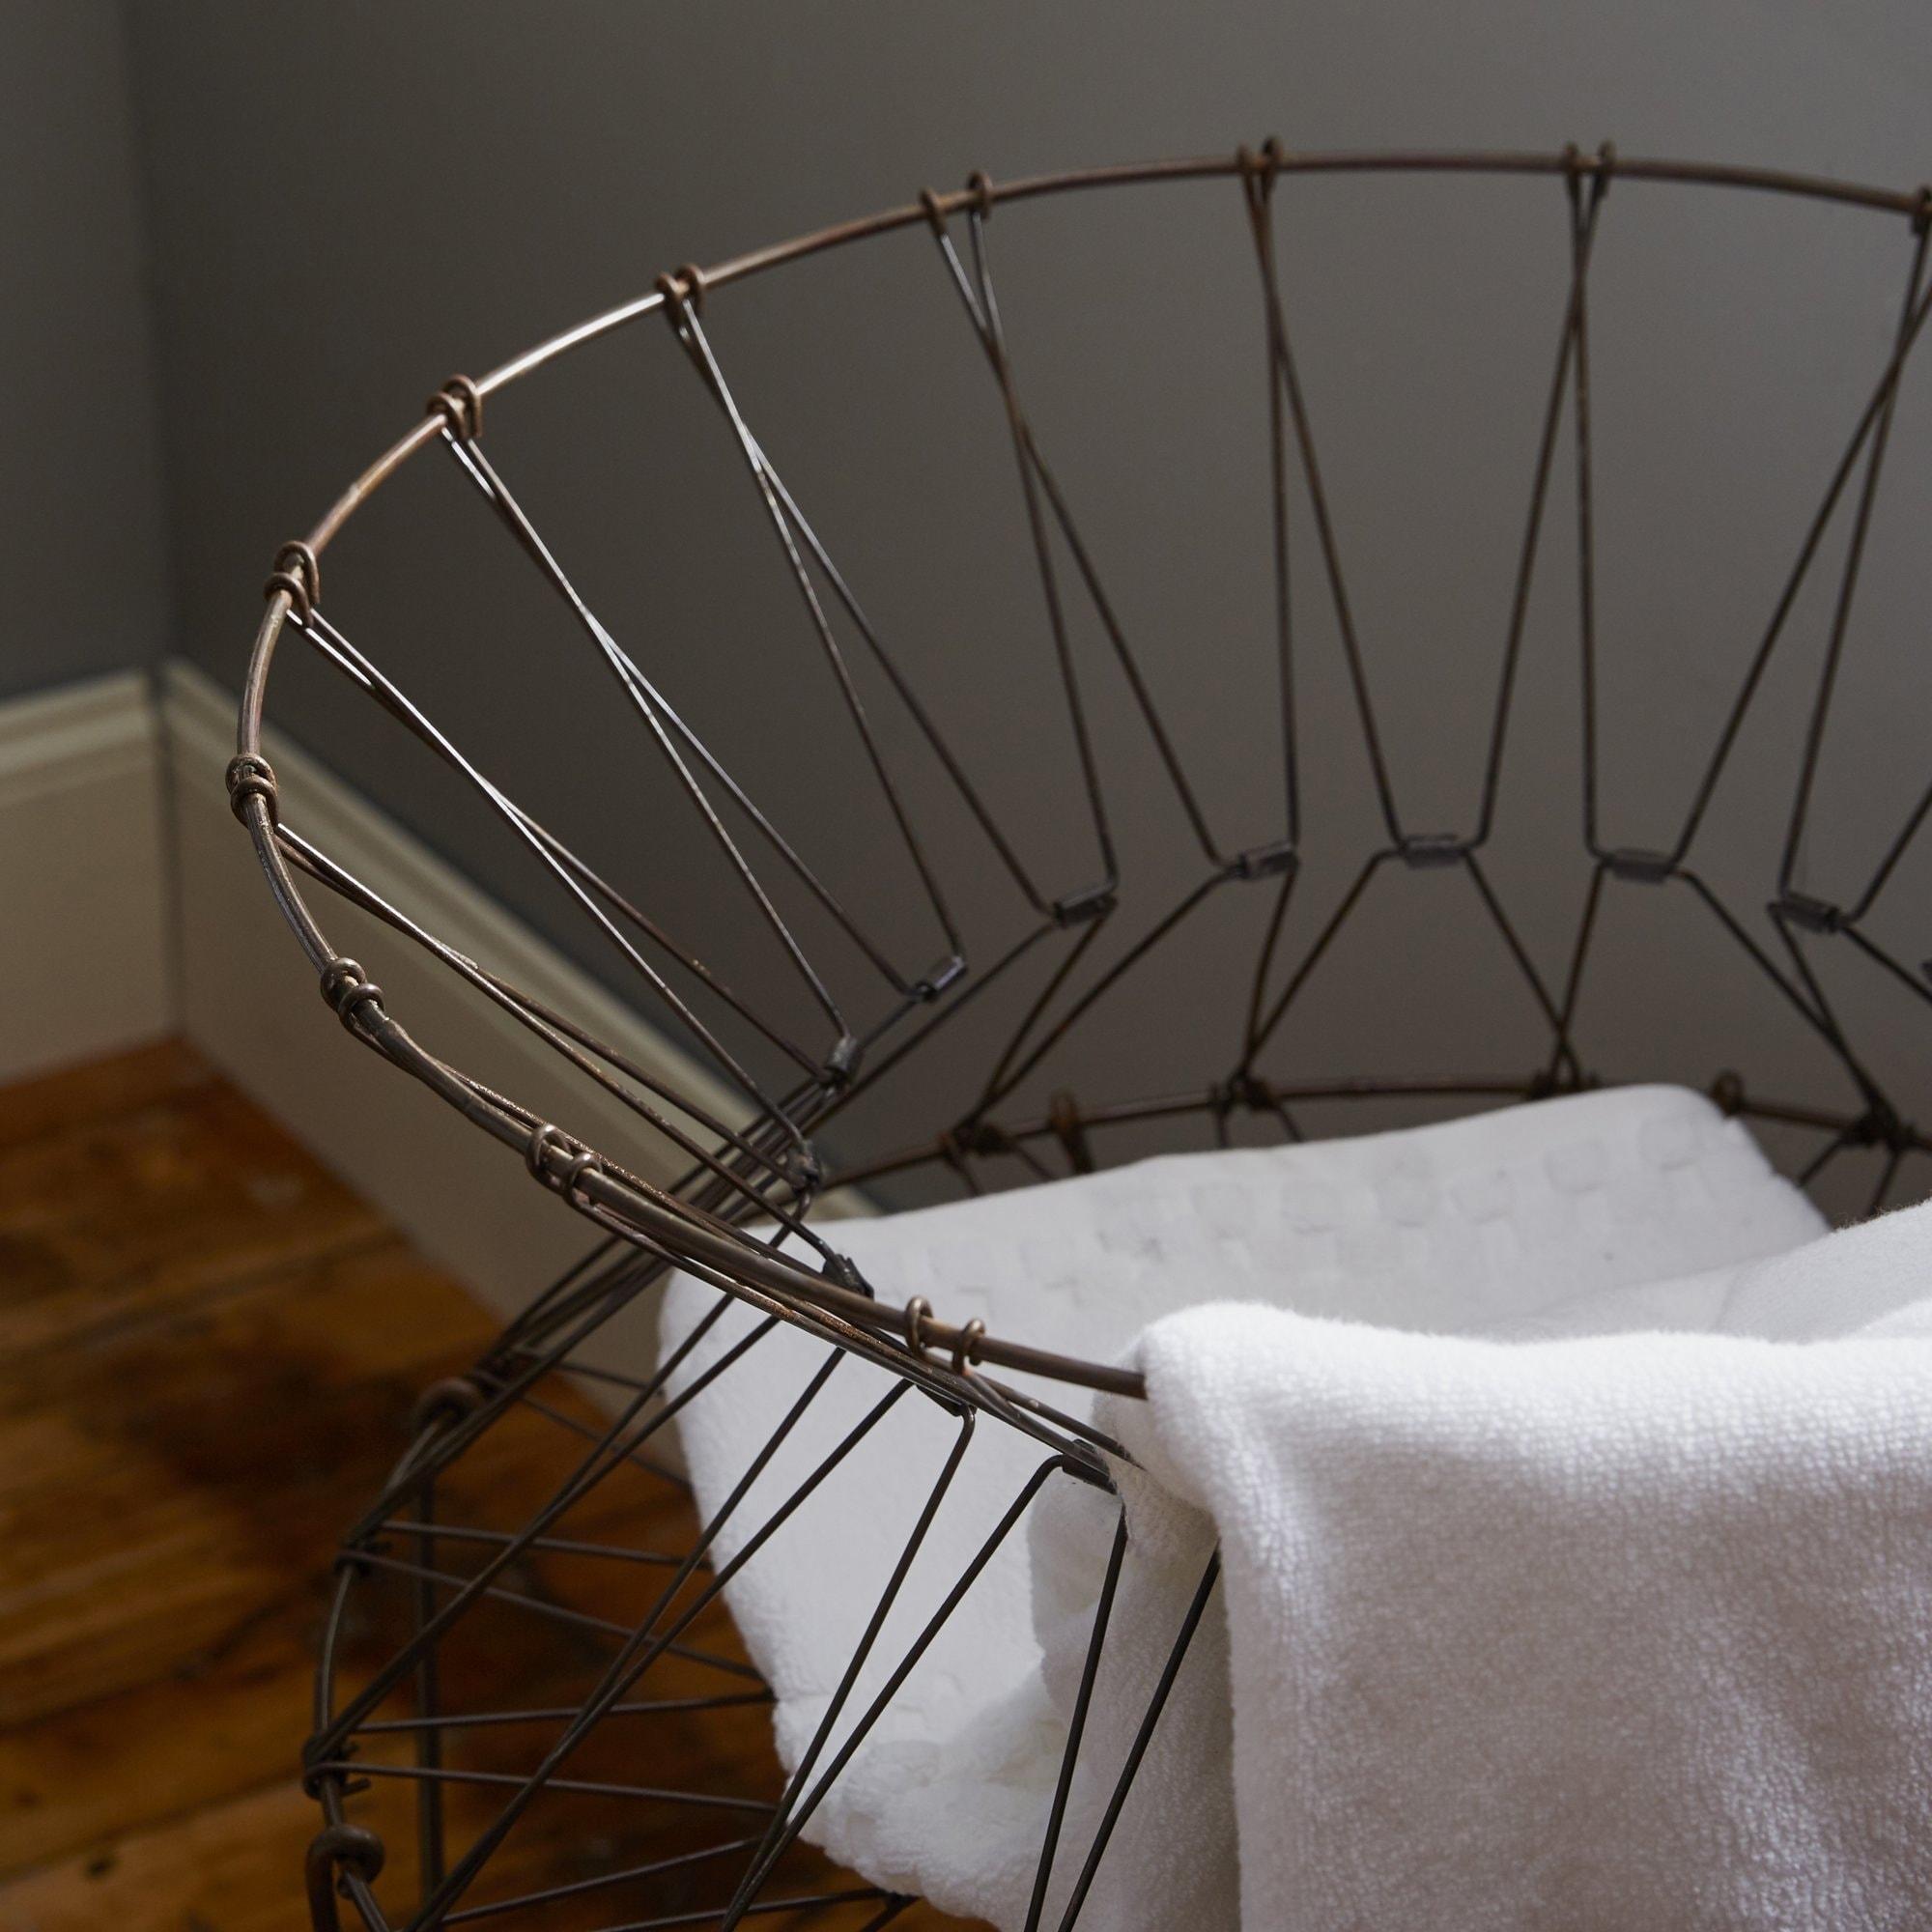 Shop Vintage Collapsible Wire Laundry Basket Hamper - On Sale - Free ...